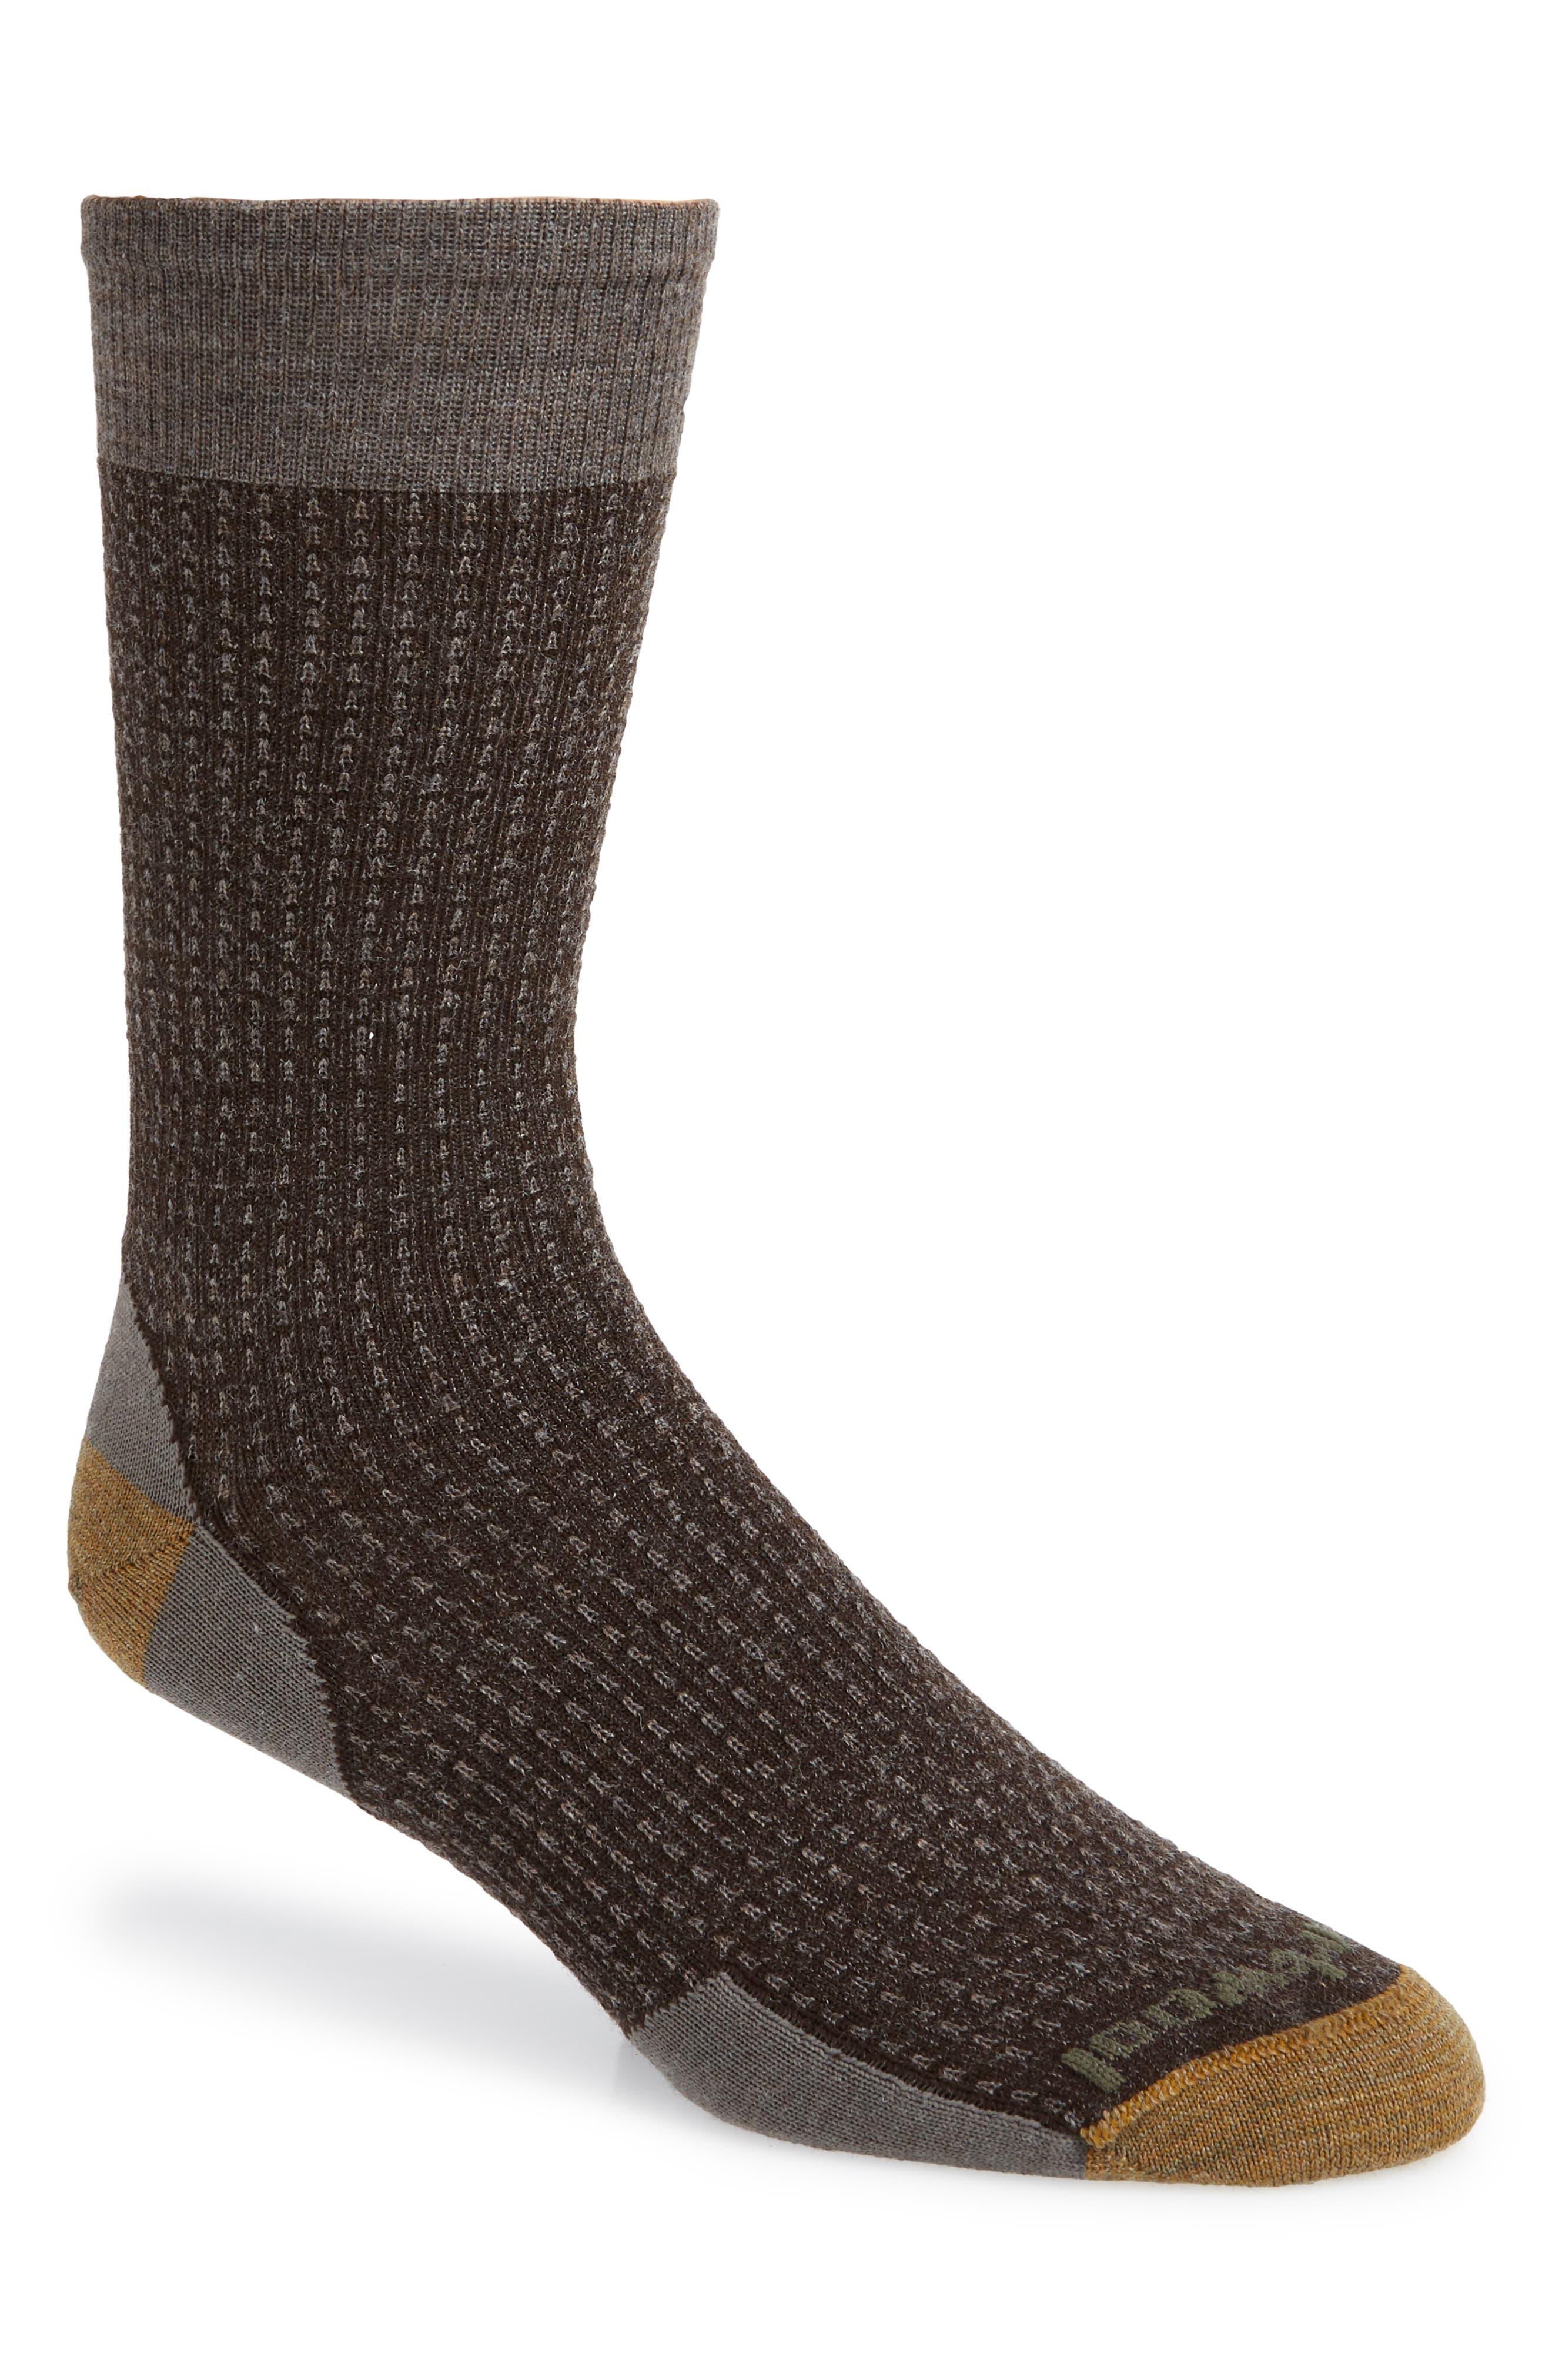 Premium East Gate Socks,                         Main,                         color, TAUPE HEATHER